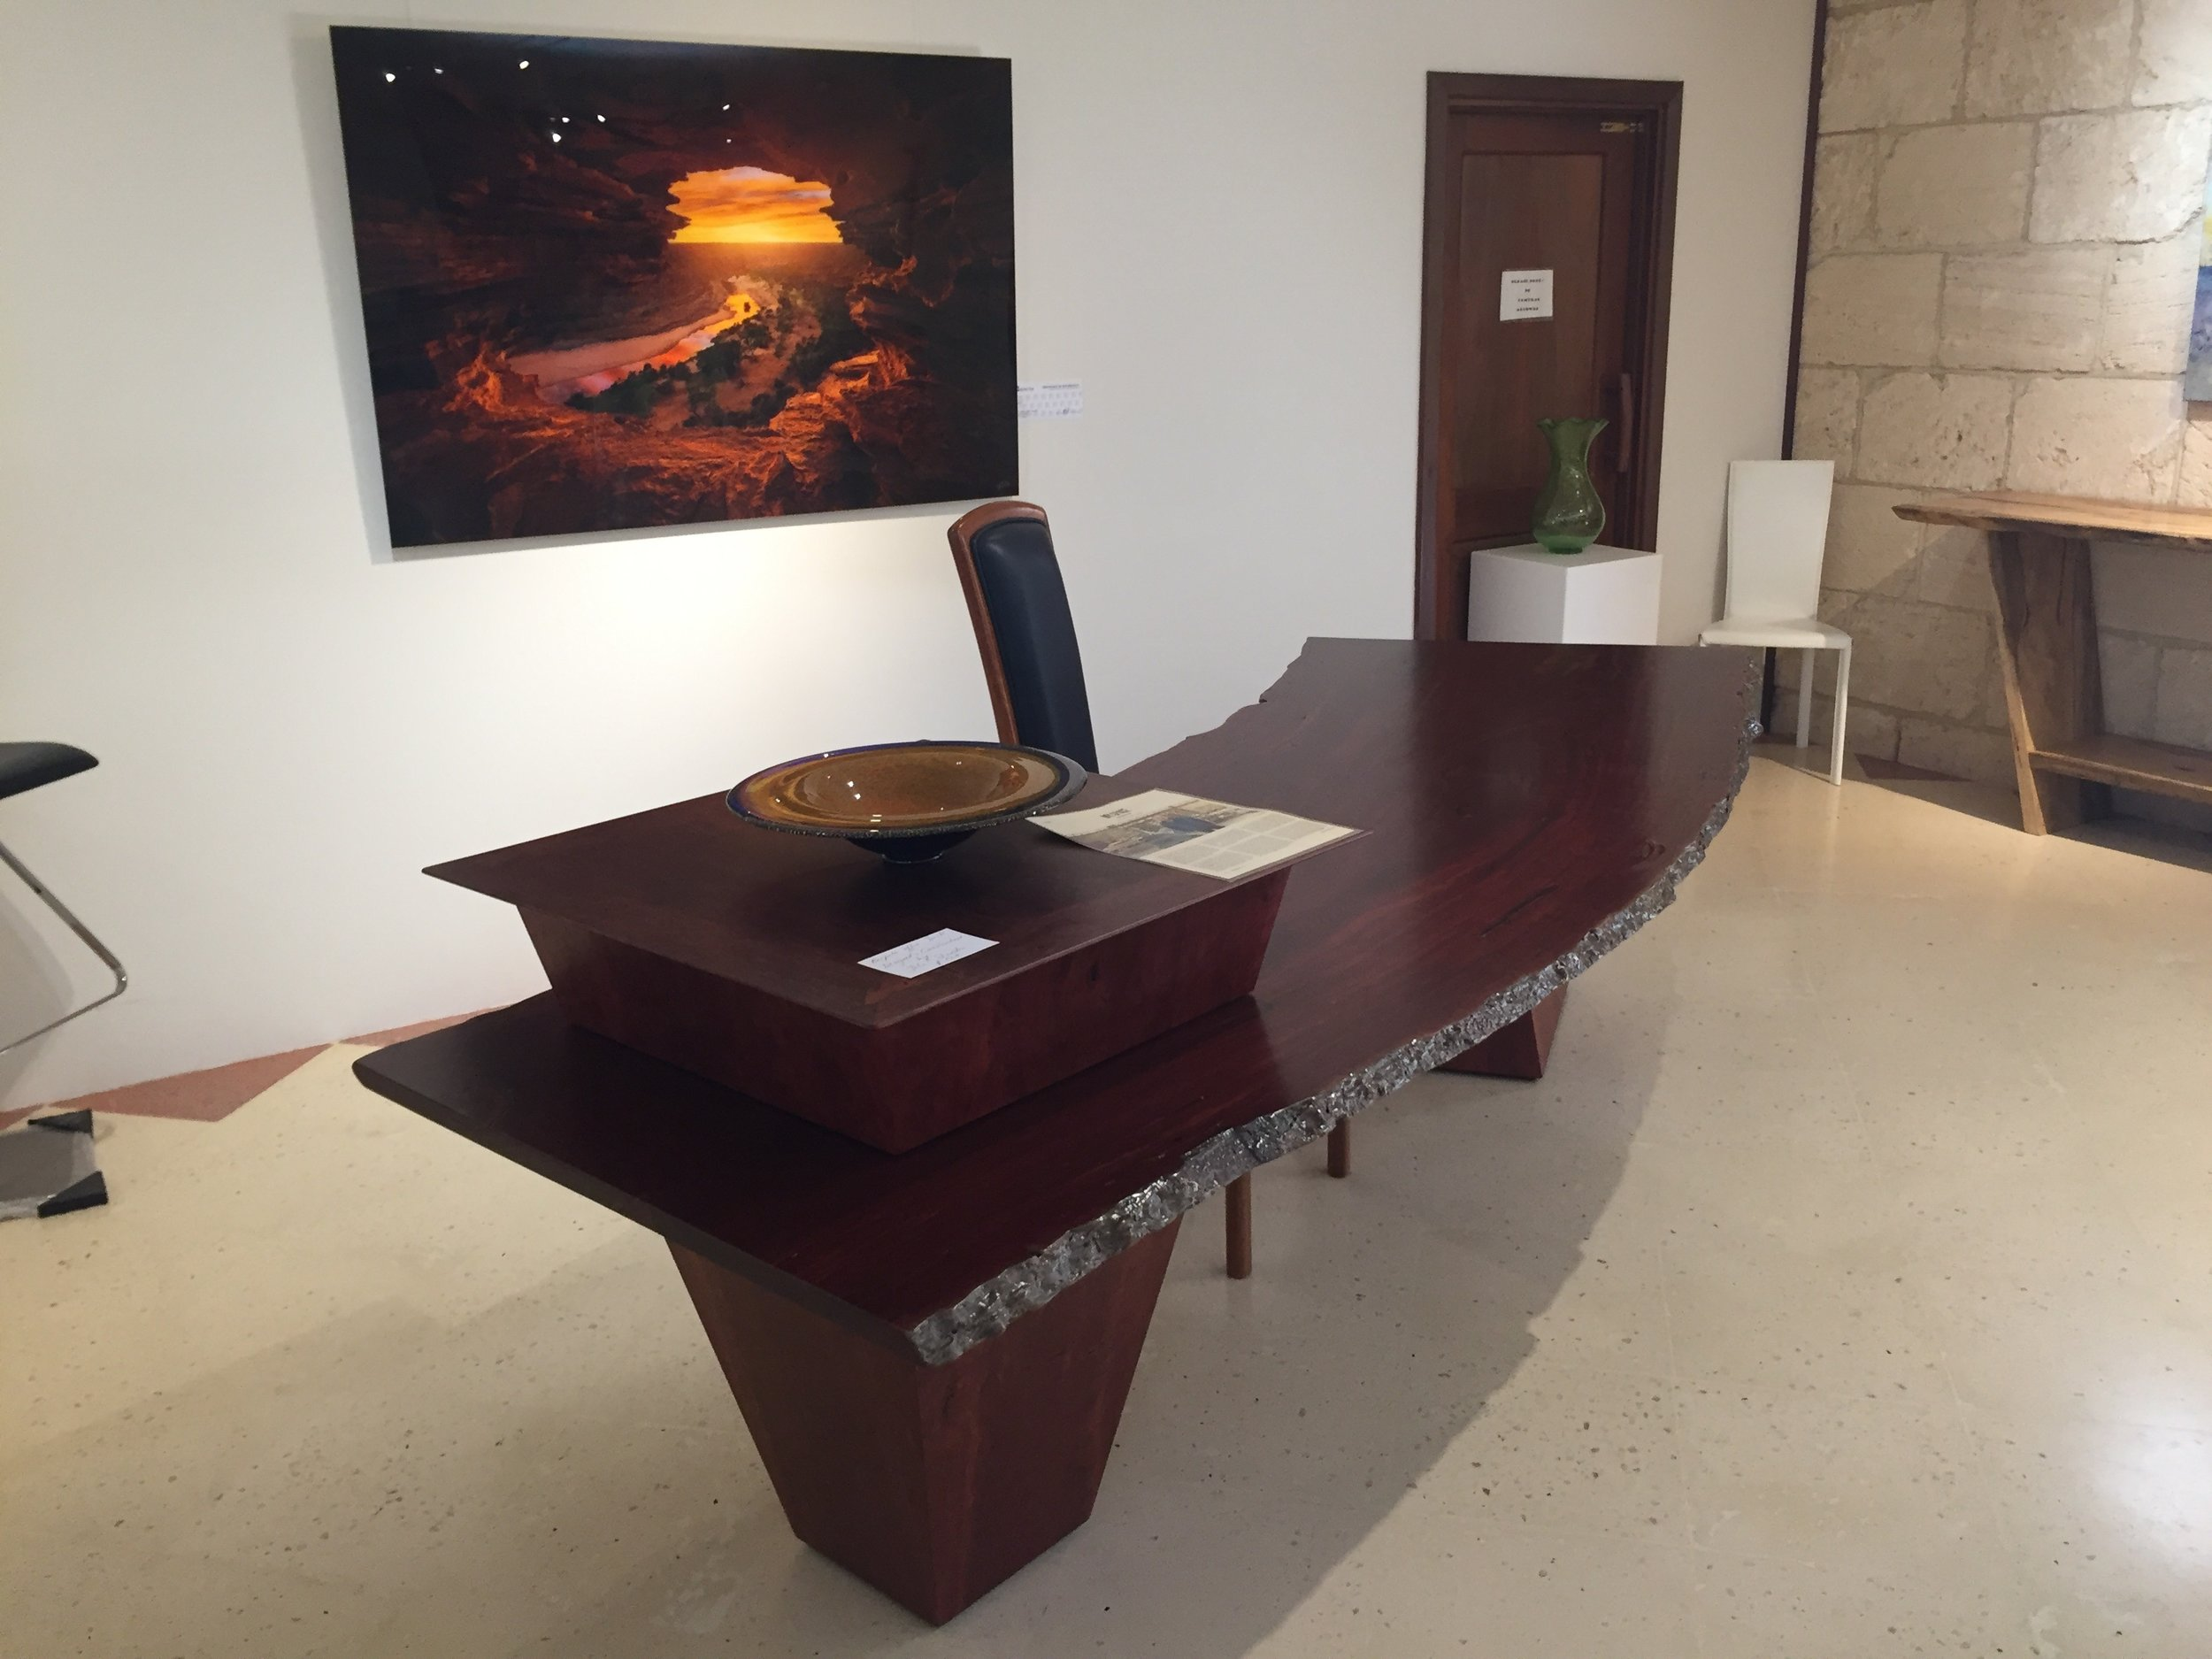 Jarrah-Pyramid-desk-Designed-and-Constructed-by-John-Streater-No-2.jpg